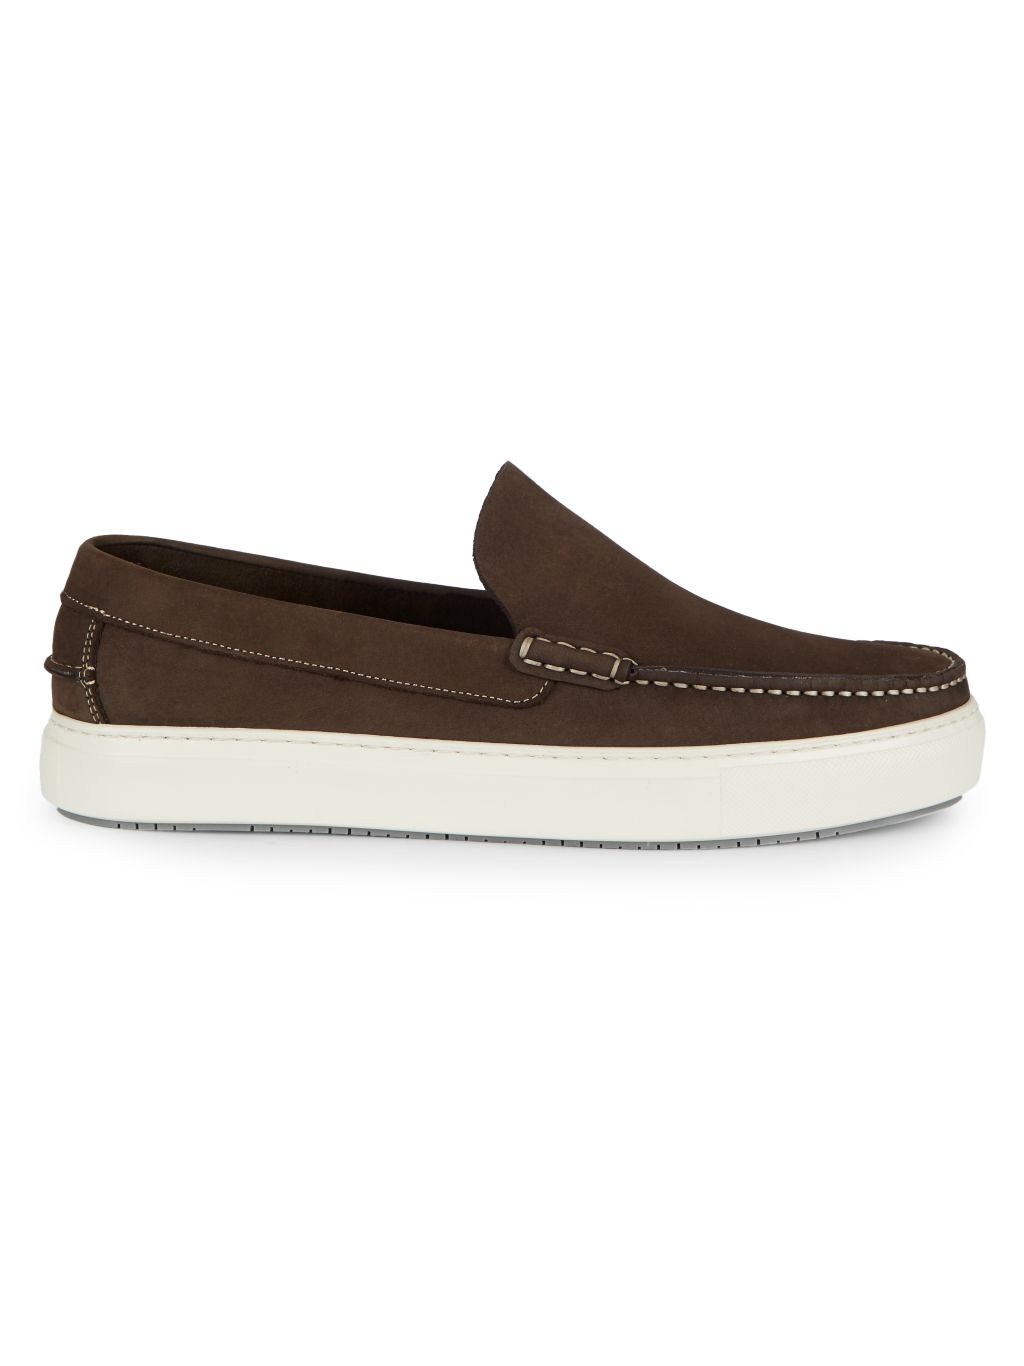 Aquatalia Sergio Weatherproof Suede Slip-On Sneakers